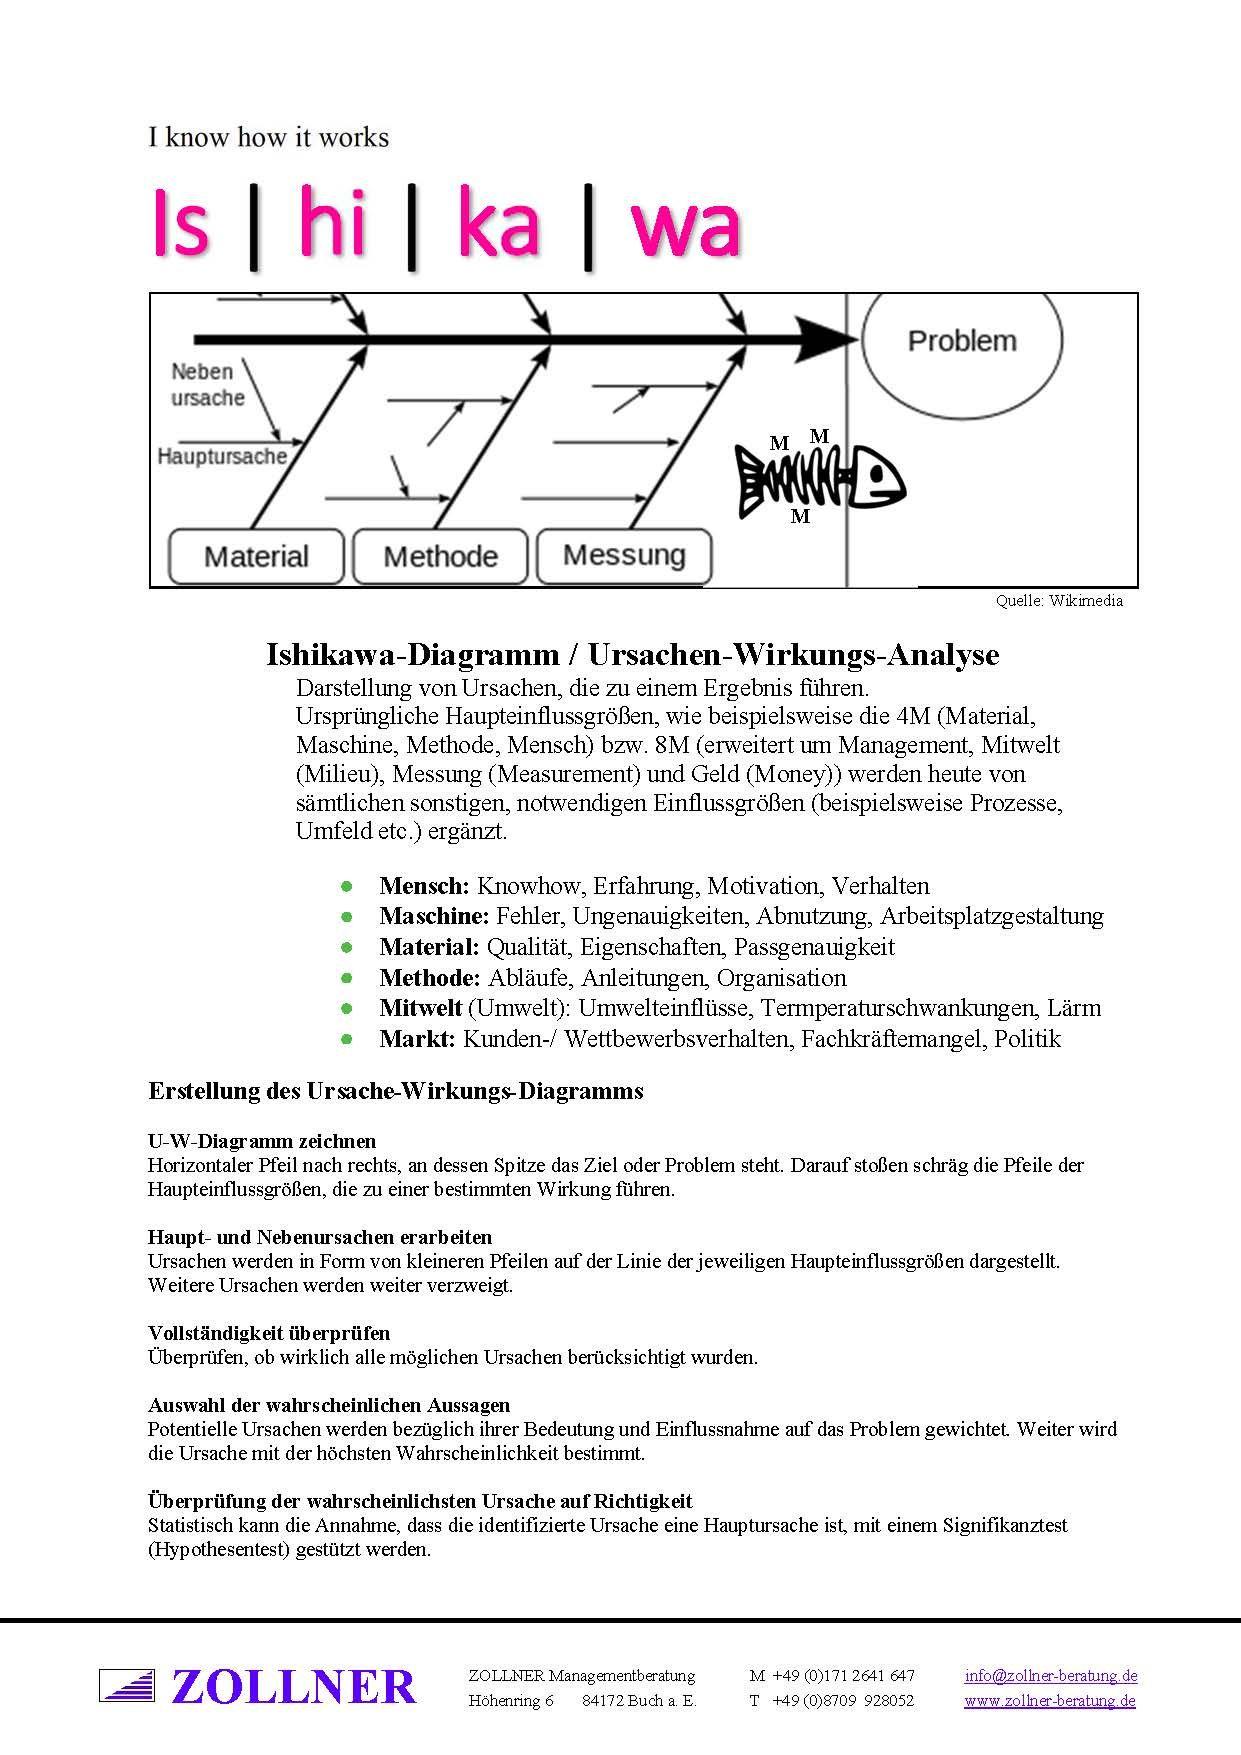 Tool Box Ishikawa Ursache Wirkung Fischgratendiagramm Wolfgang Zollner Ishikawa Lernmethoden Lernen